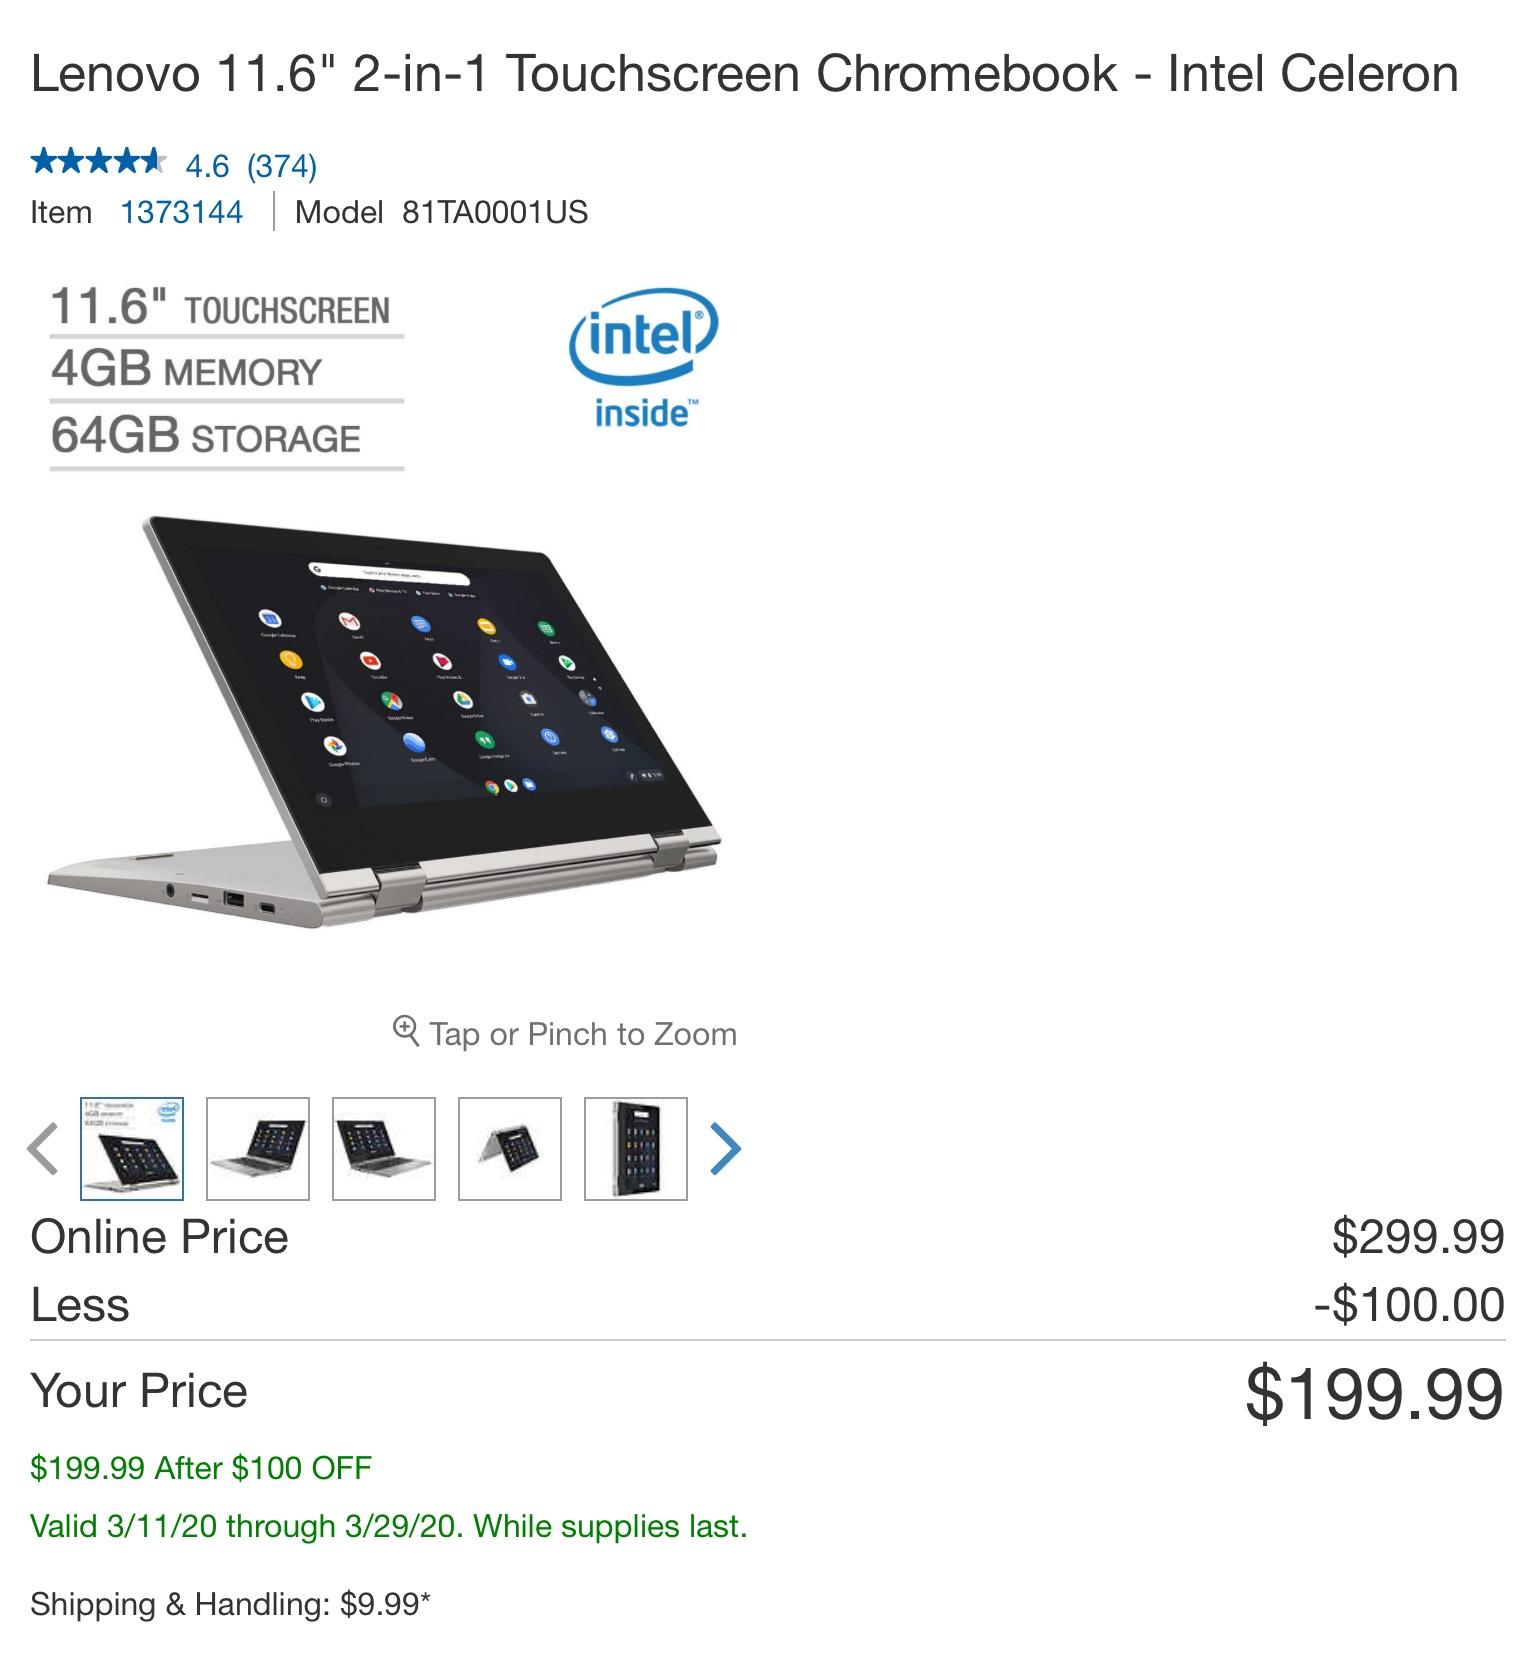 "Costco - Lenovo 11.6"" 2-in-1 Touchscreen Chromebook - Intel Celeron $199.99"